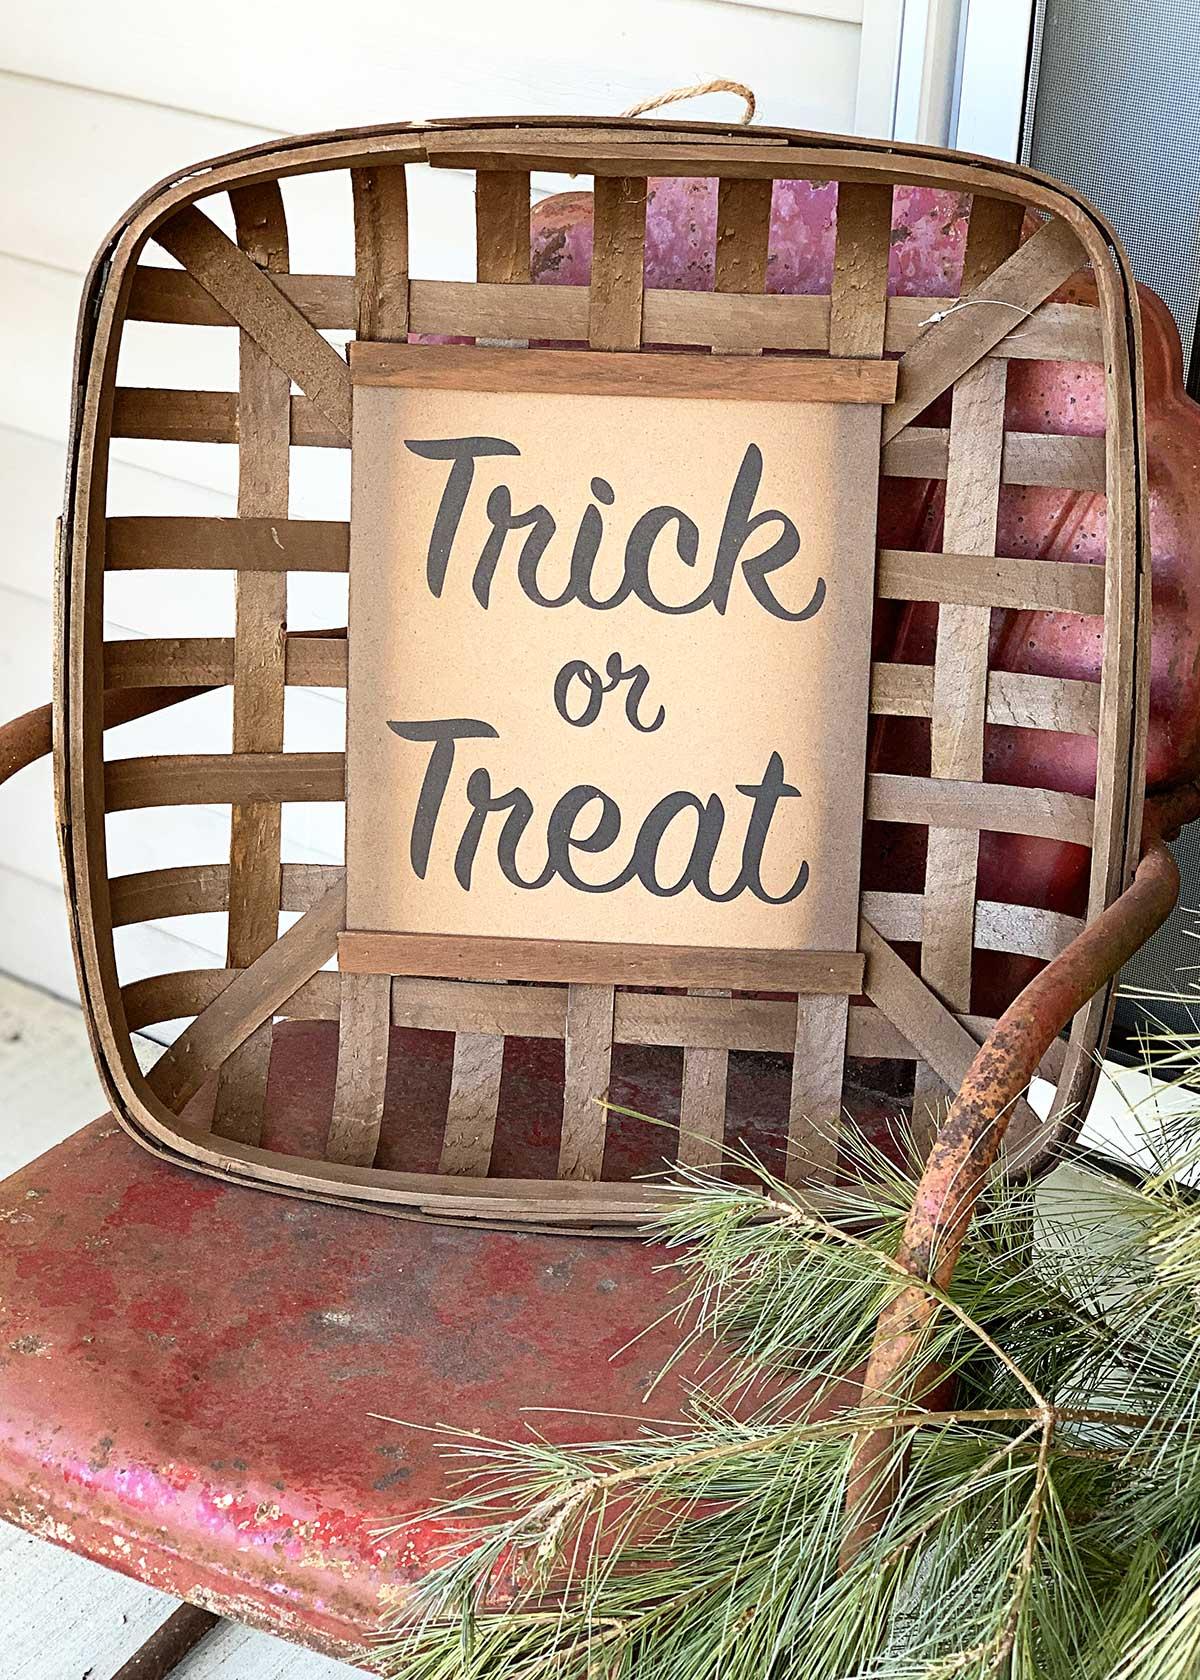 a tobacco basket sitting on a metal motel chair